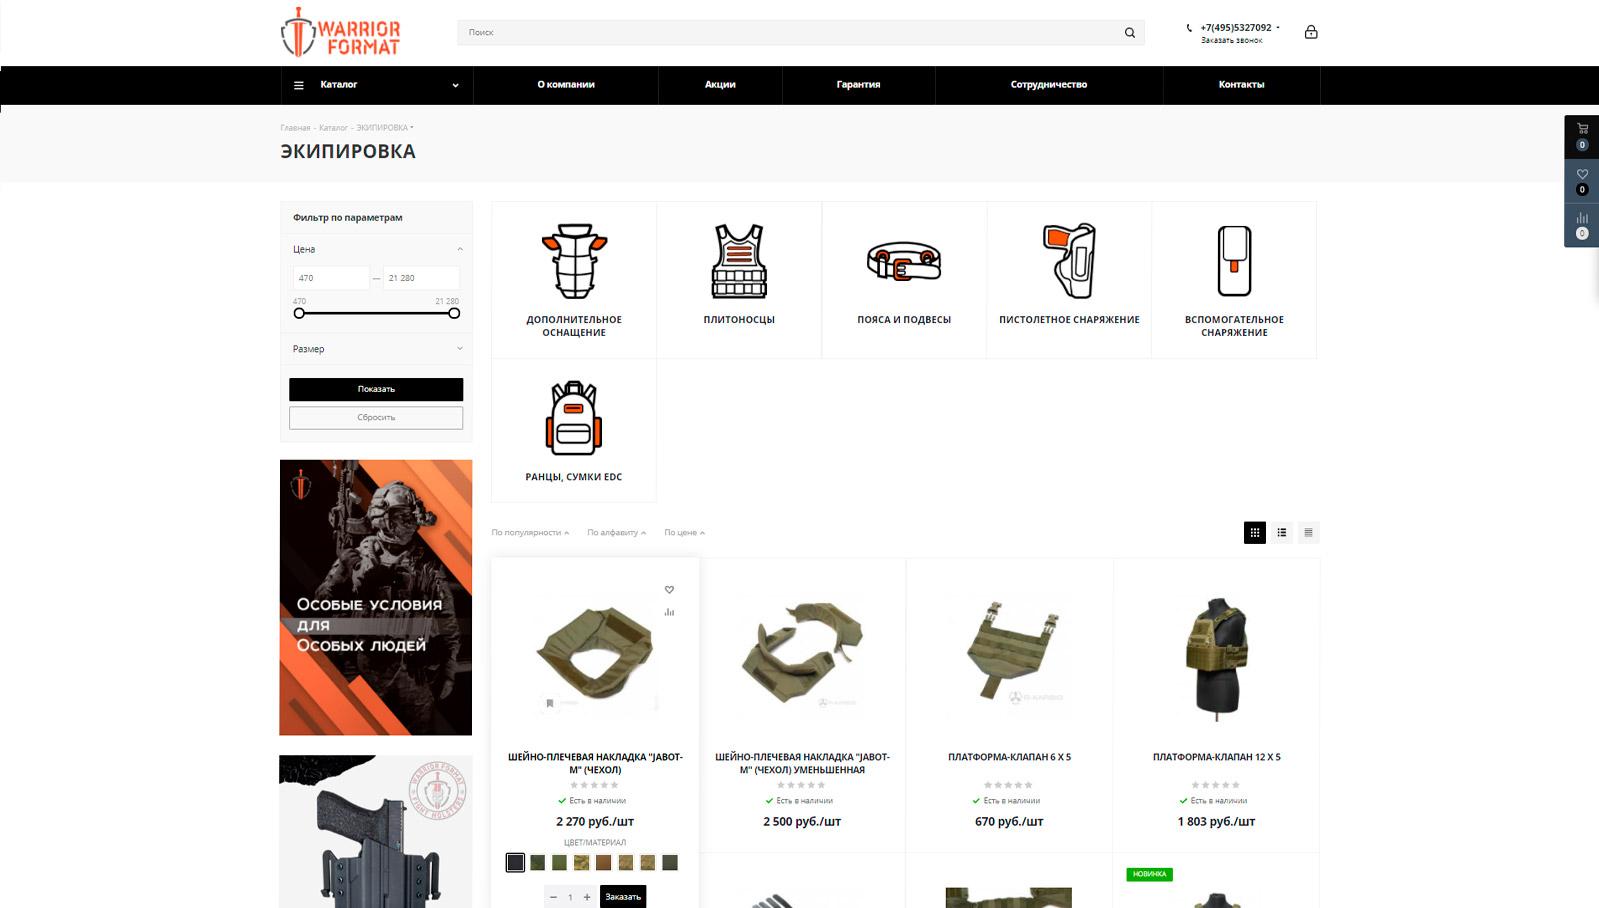 SPS_sajt_warrior-format.ru5